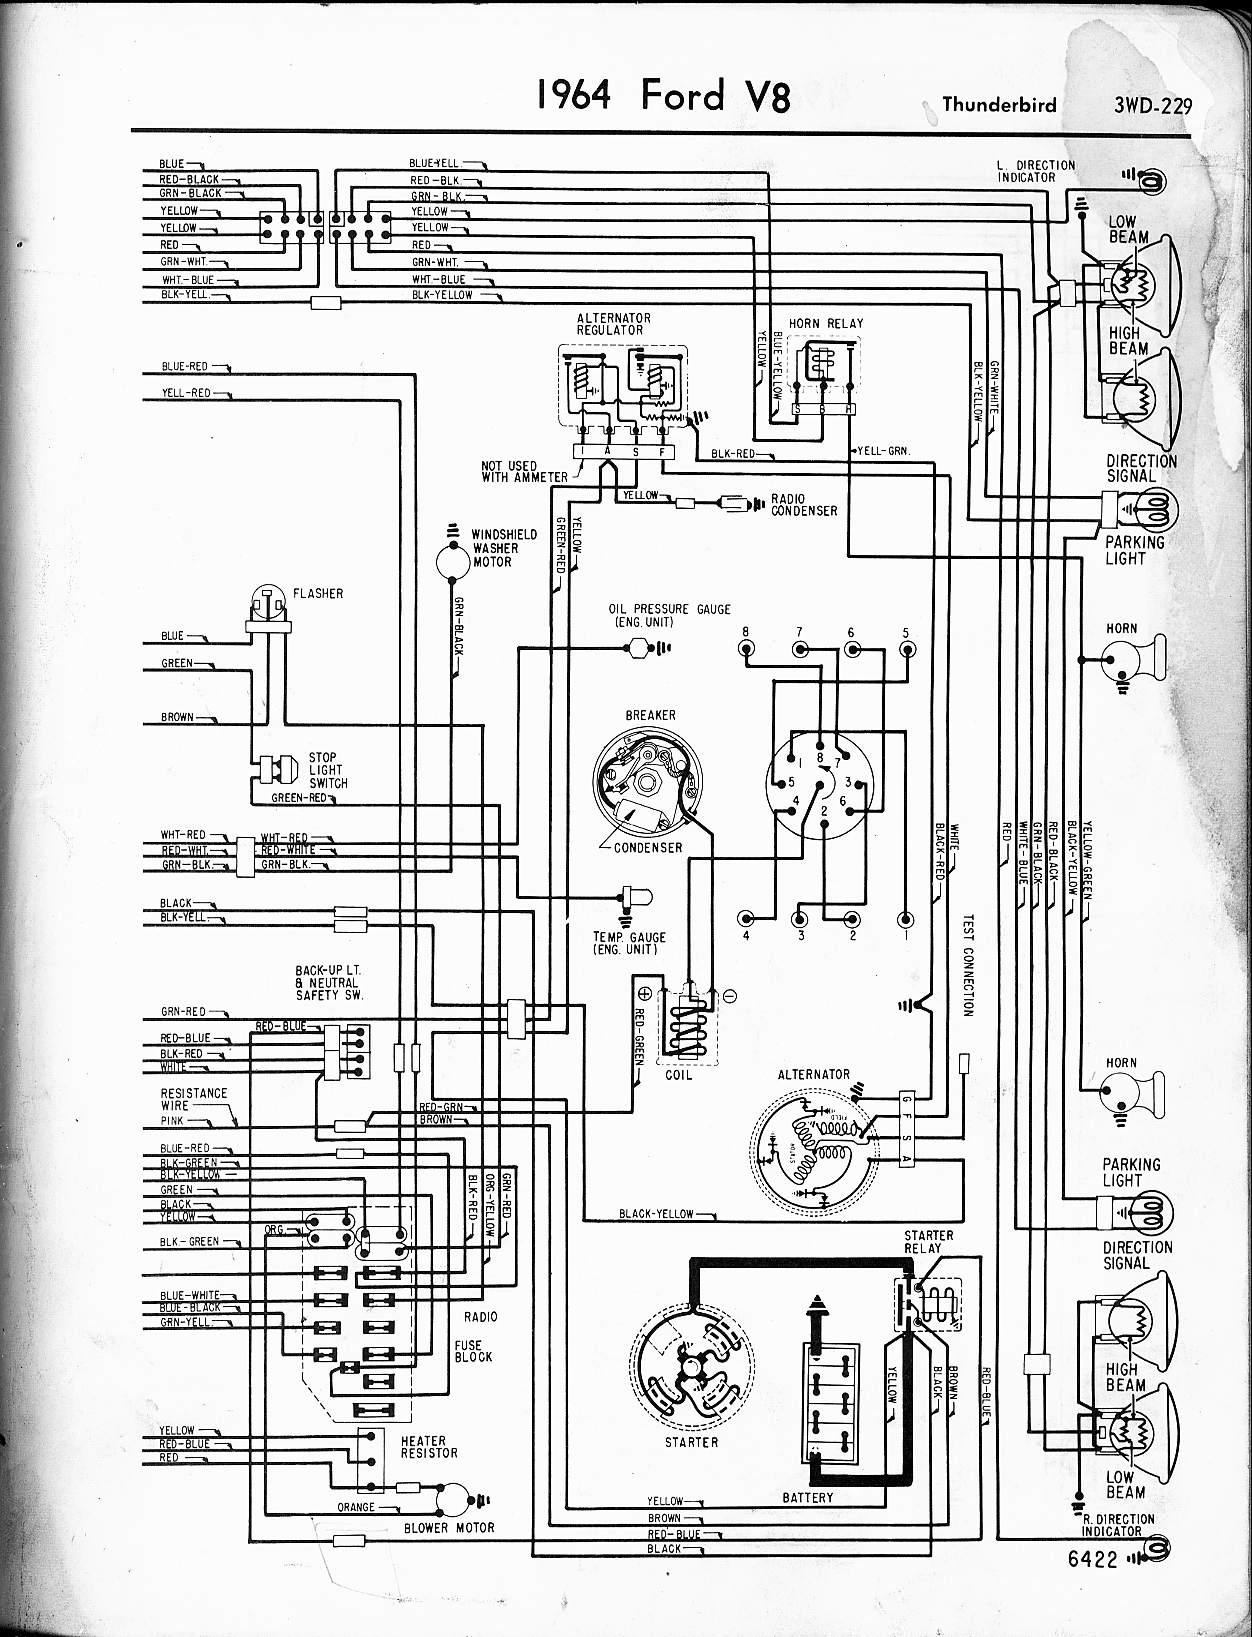 MWire5765 229?resize=665%2C869 1964 ford falcon ranchero wiring diagram wiring diagram,64 Galaxie Ac Wiring